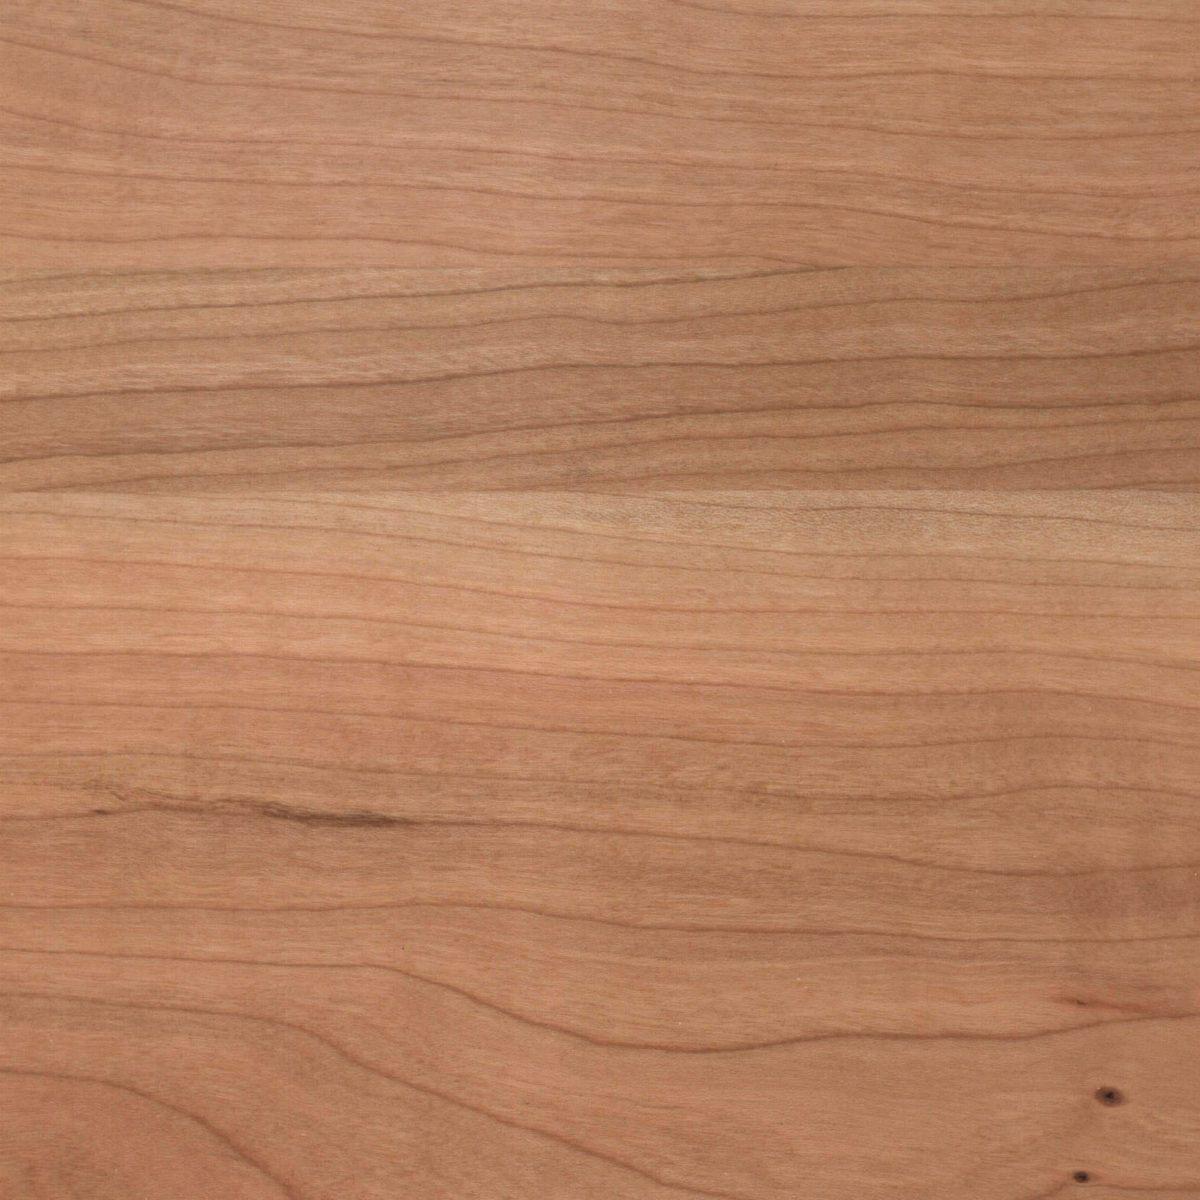 9 Cherry Wood Sample